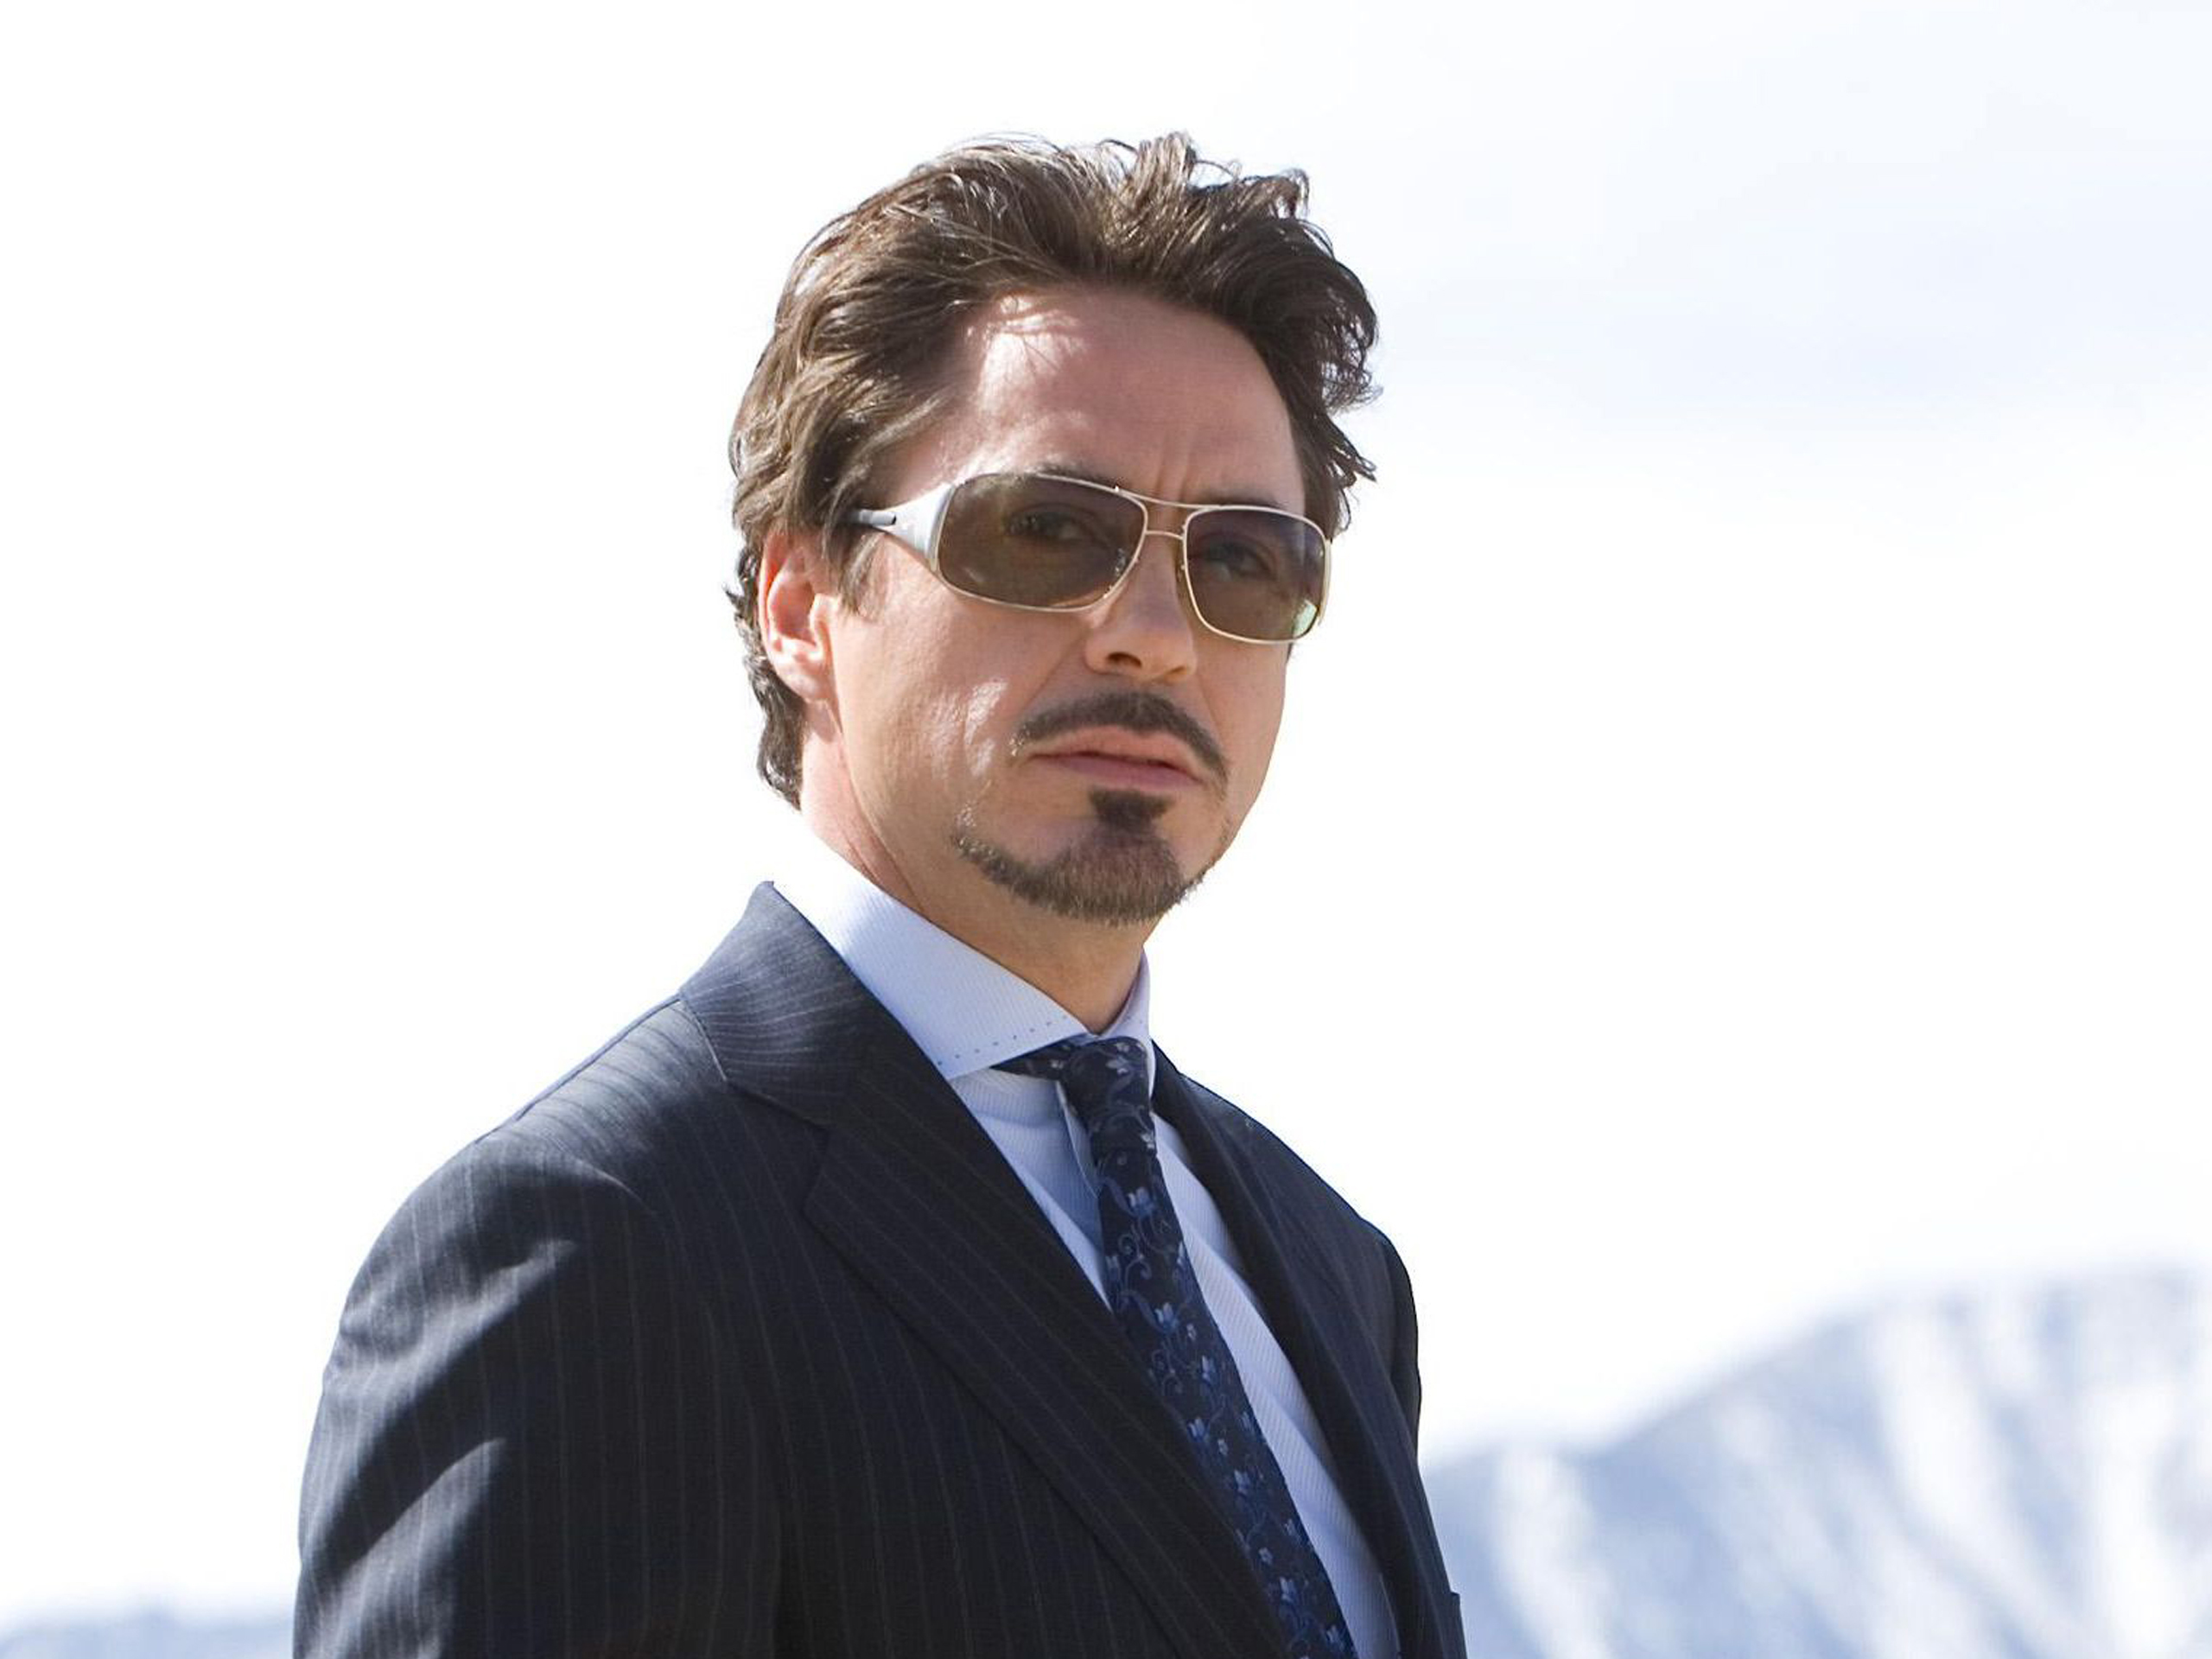 Robert Downey Jr Hd Background